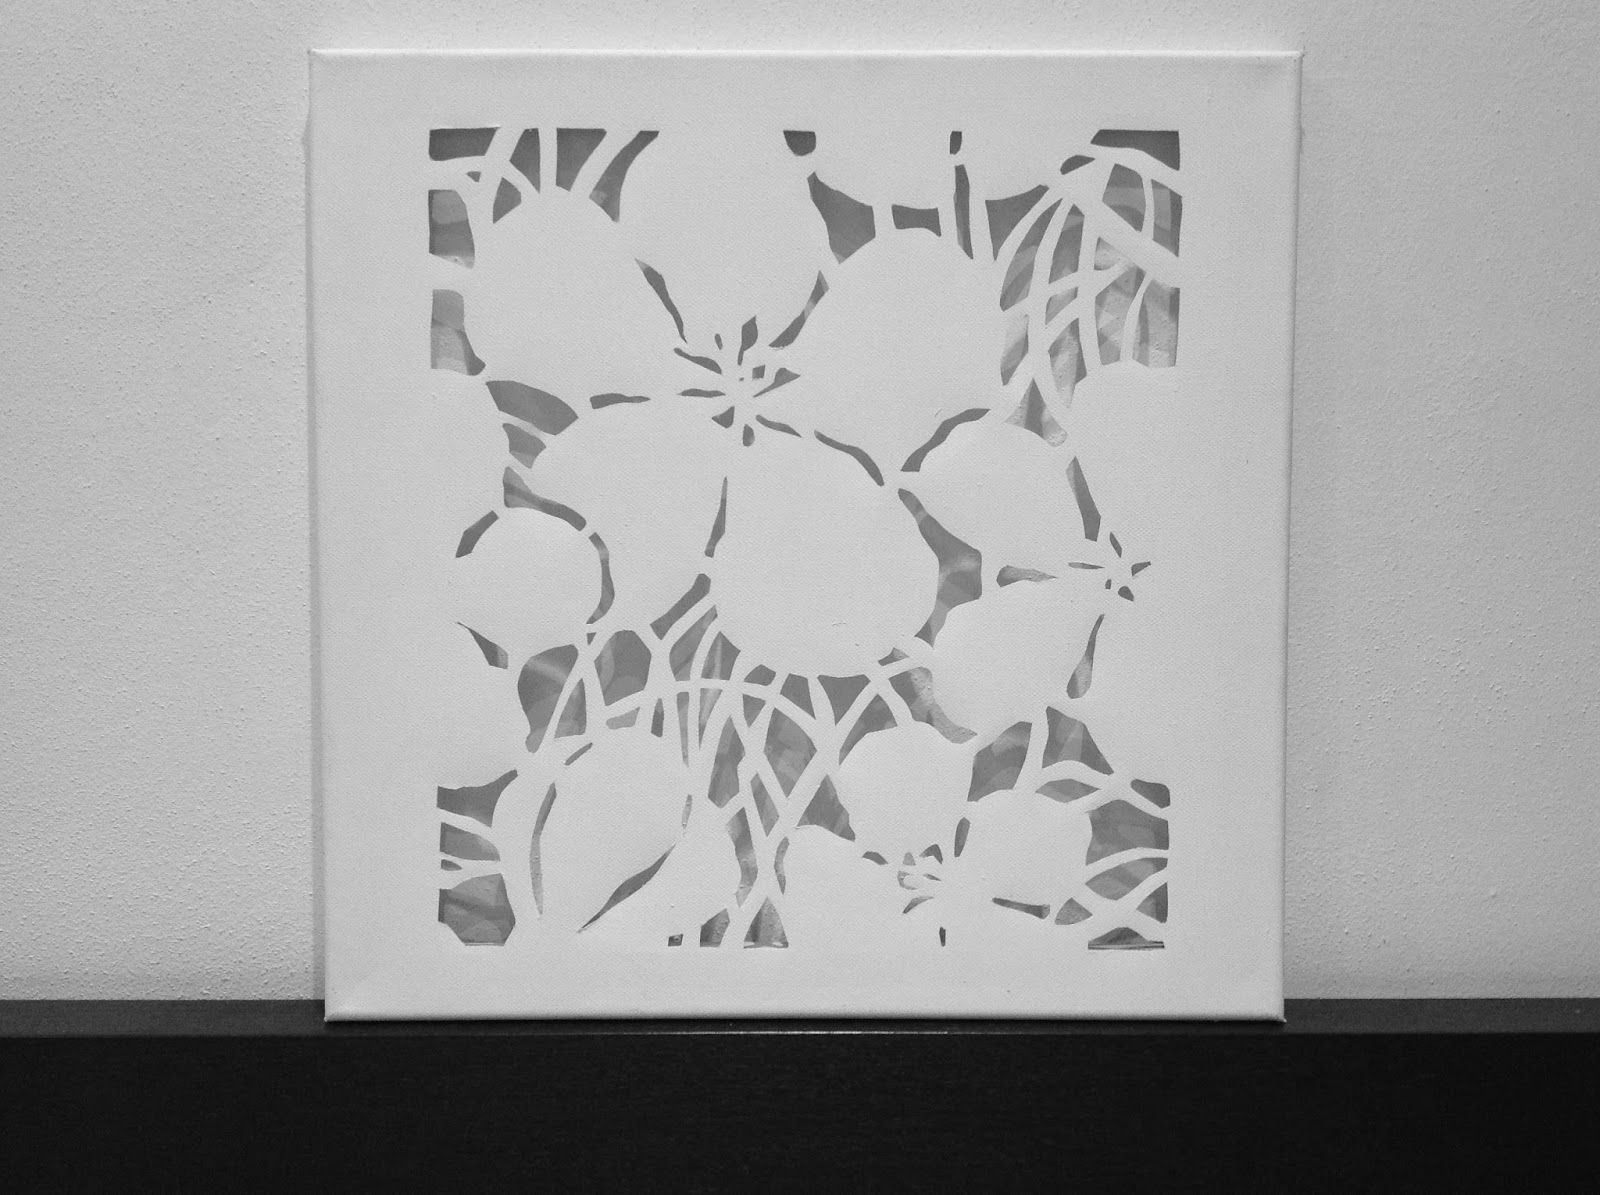 Diy canvas cutouts flowers white by judithinks - Leinwand dekorieren ...